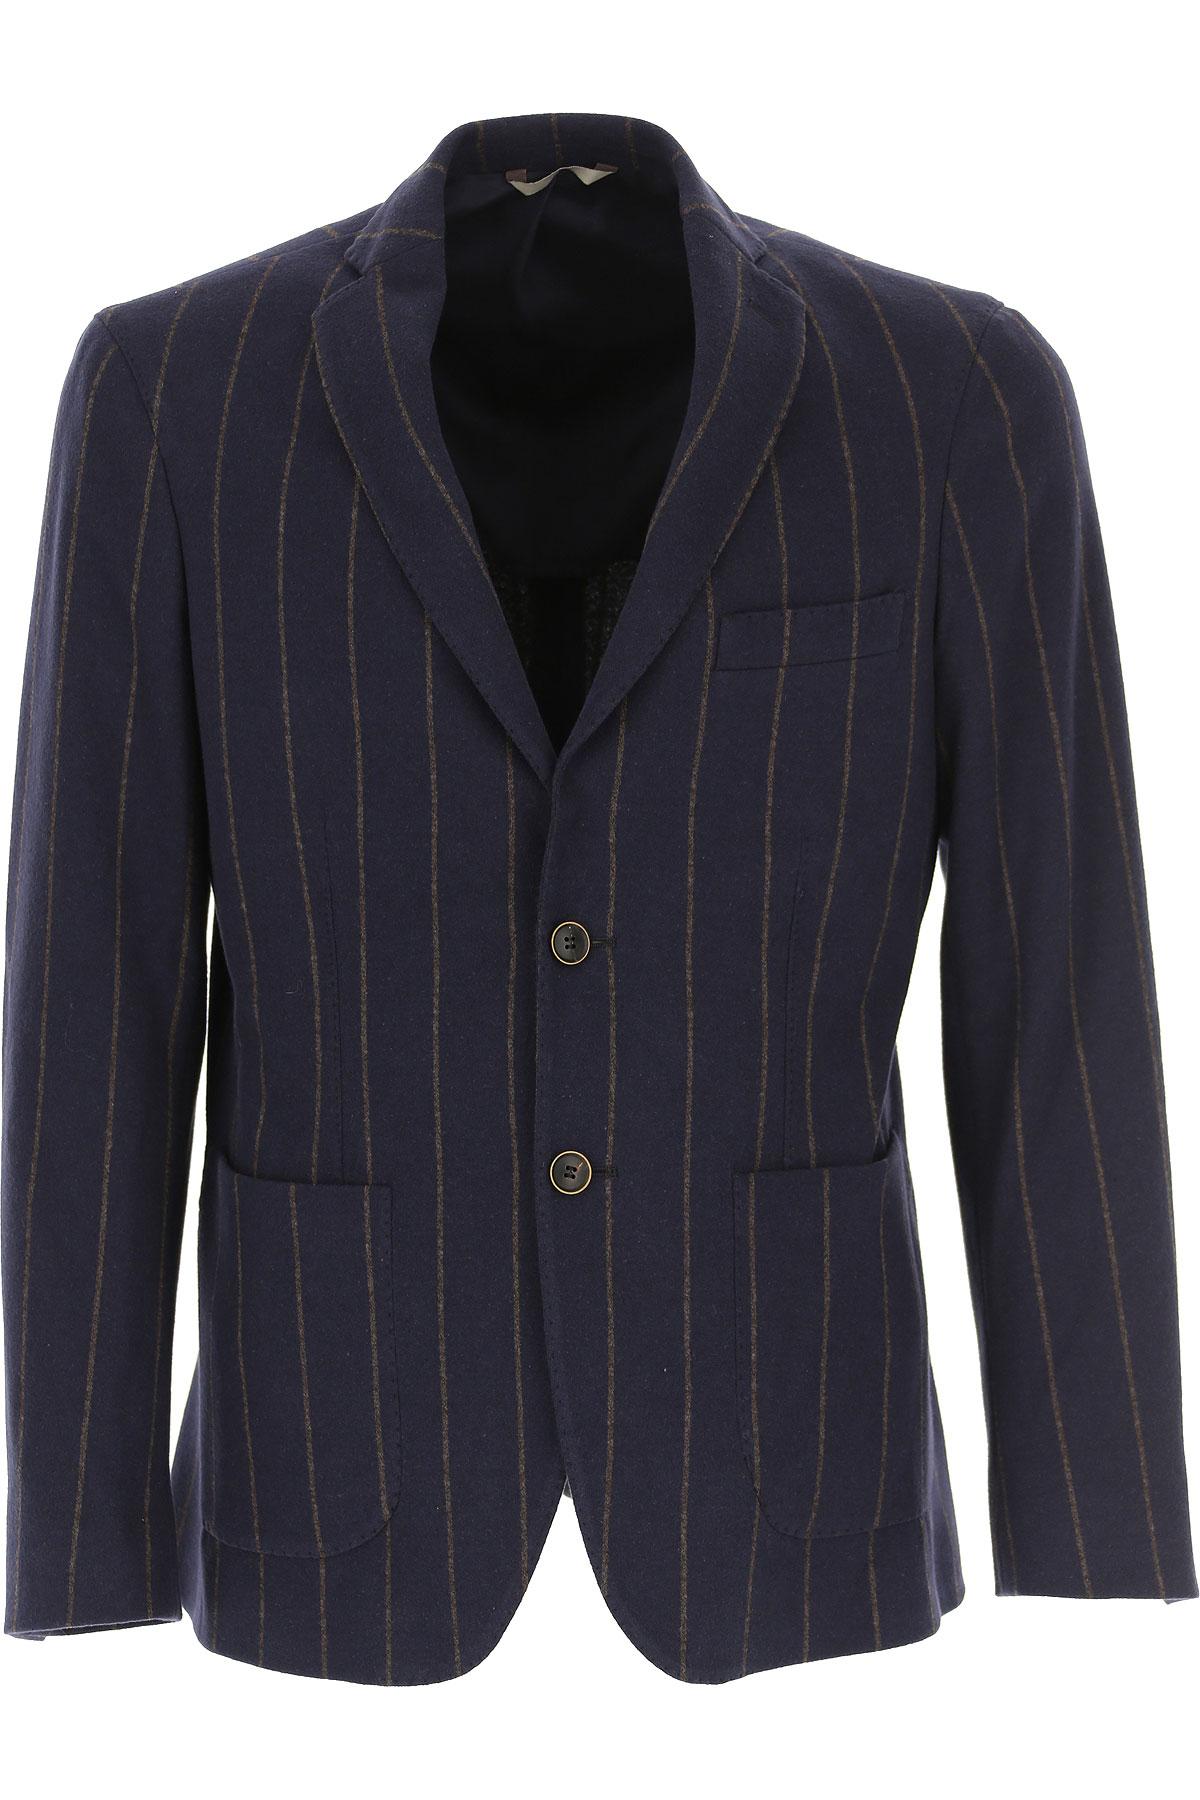 Simbols Blazer for Men, Sport Coat, Dark Navy Blue, Cotton, 2019, L M S